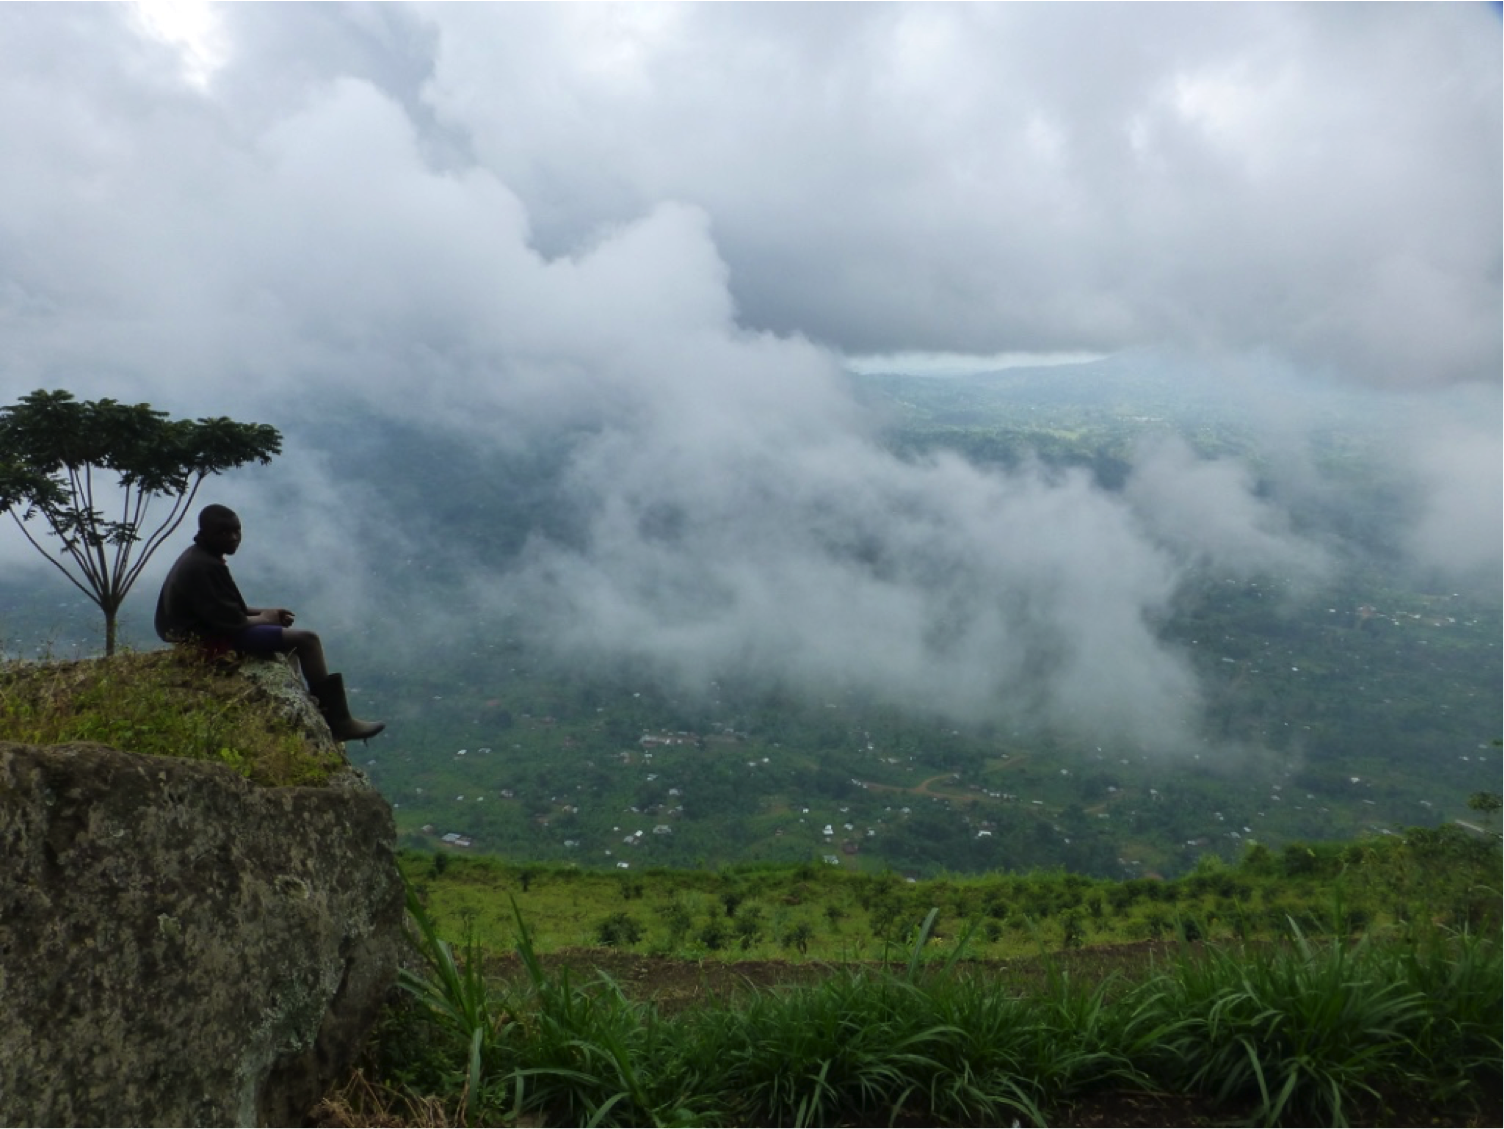 Finding Evidence for Land-restoration Strategies